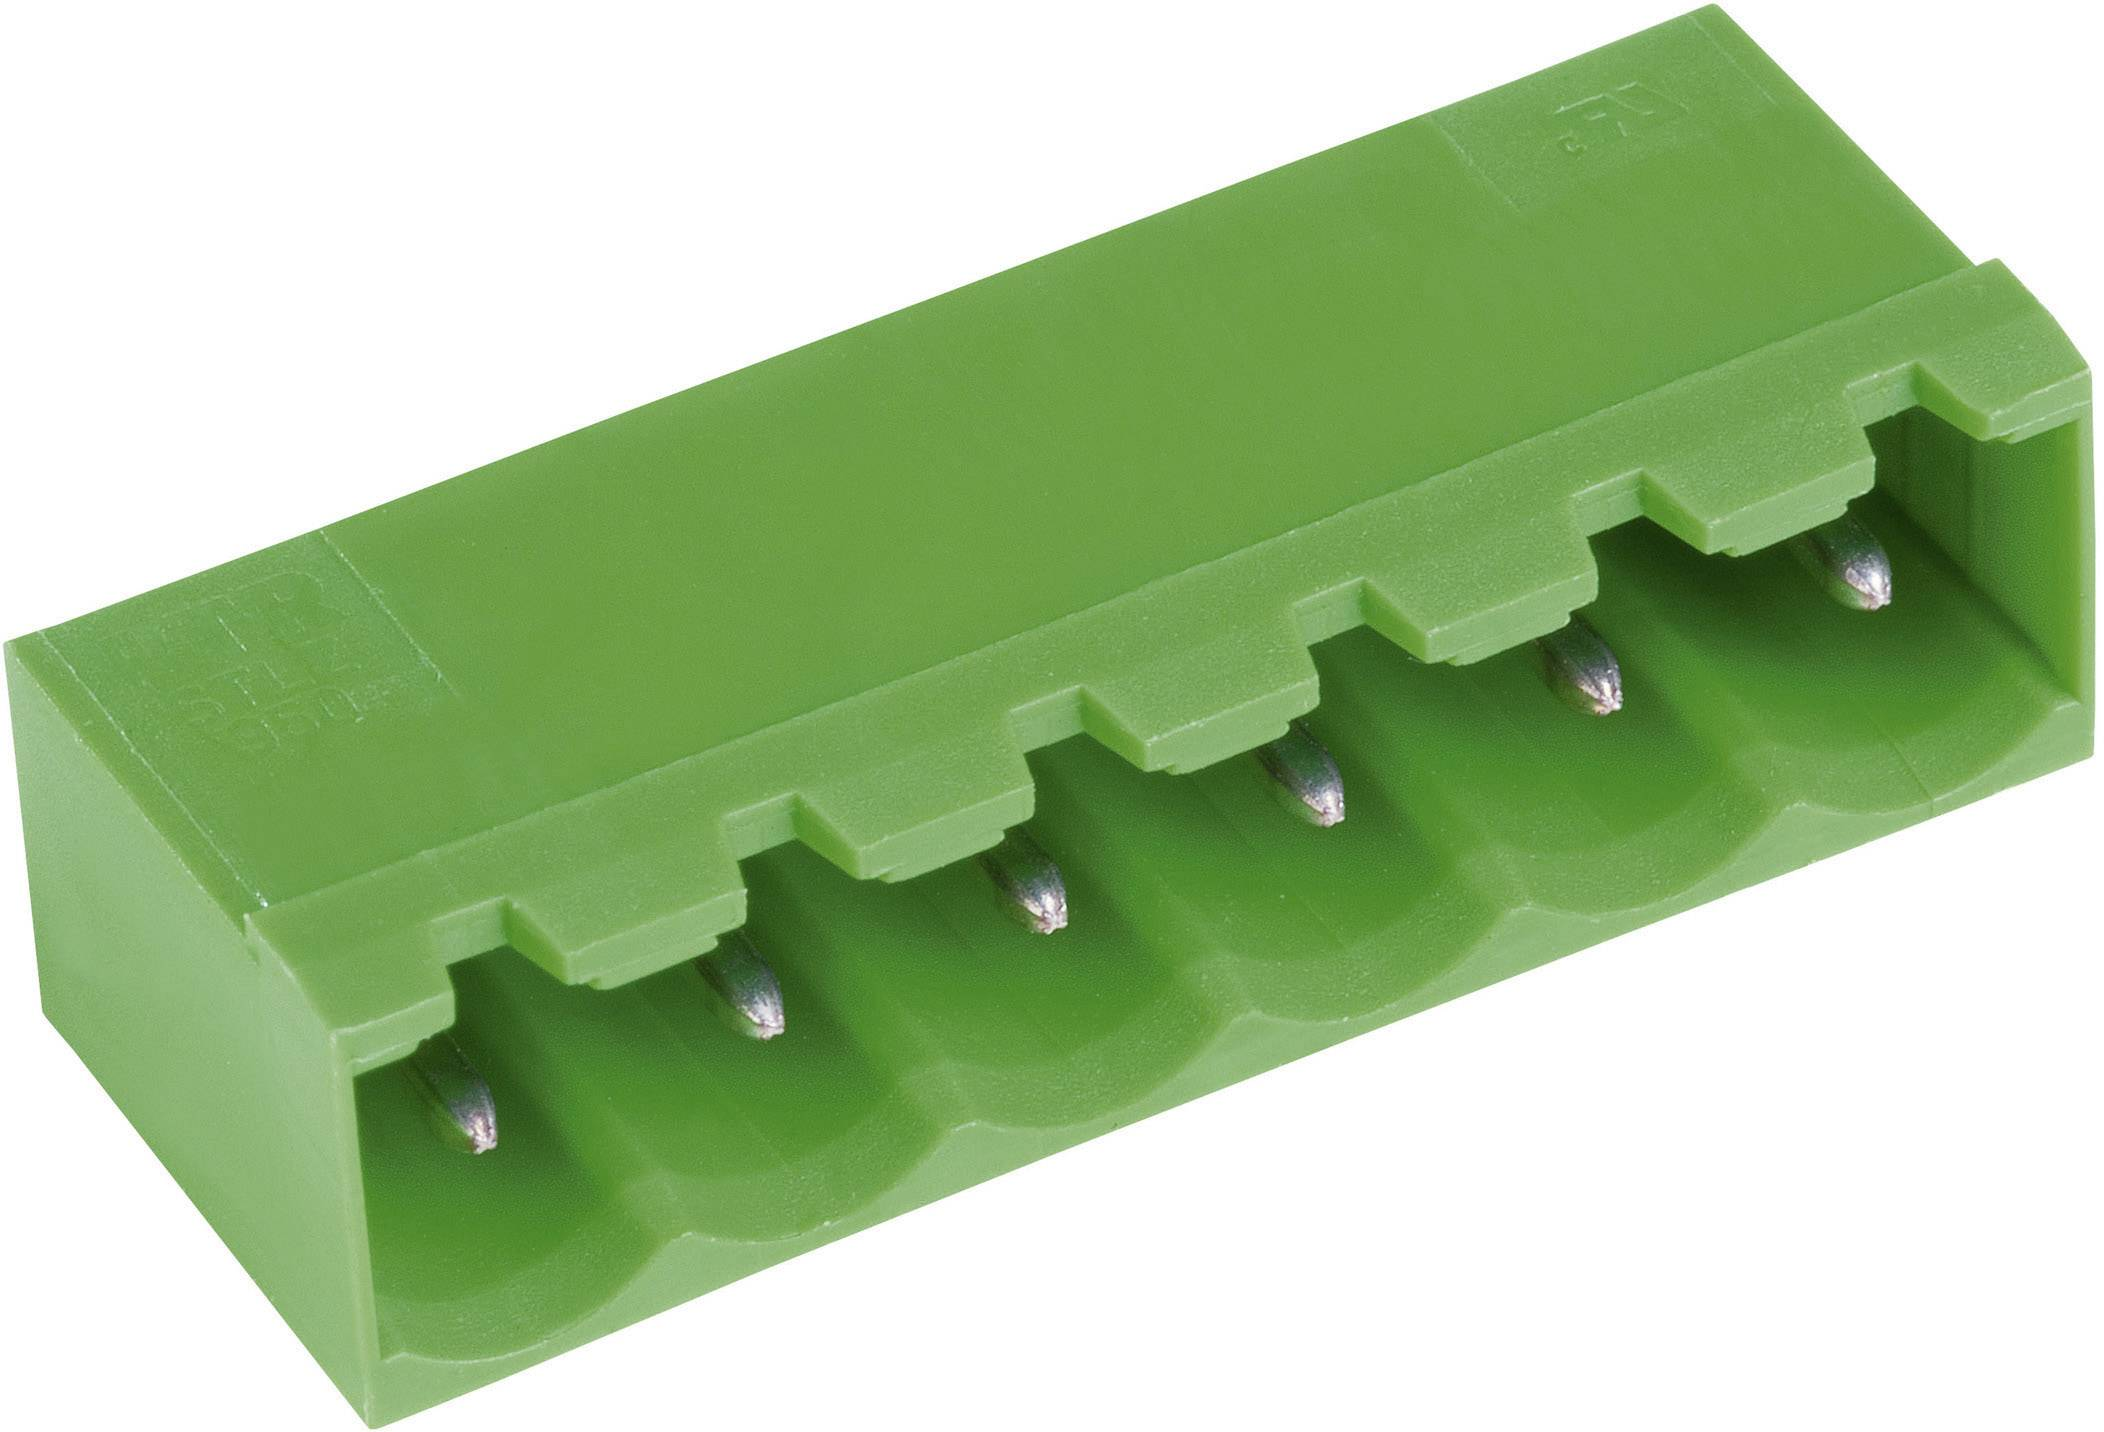 Konektor do DPS PTR STLZ950/12G-5.08-H 50950125021D, 62.16 mm, pólů 12, rozteč 5.08 mm, 1 ks